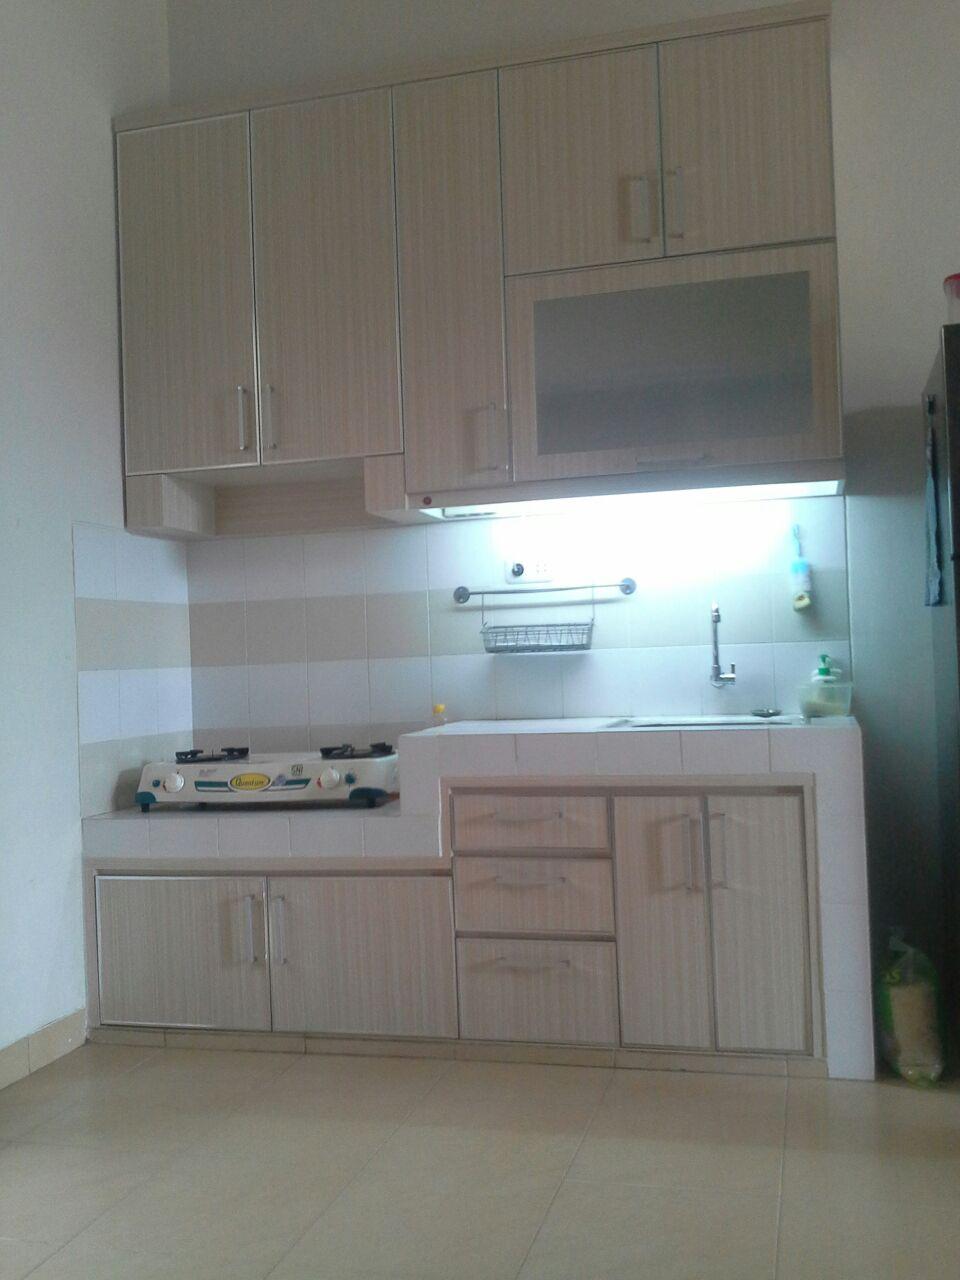 Jual Kitchen Set Murah | 0857.1768.1534 | Produsen Furniture Custom ...